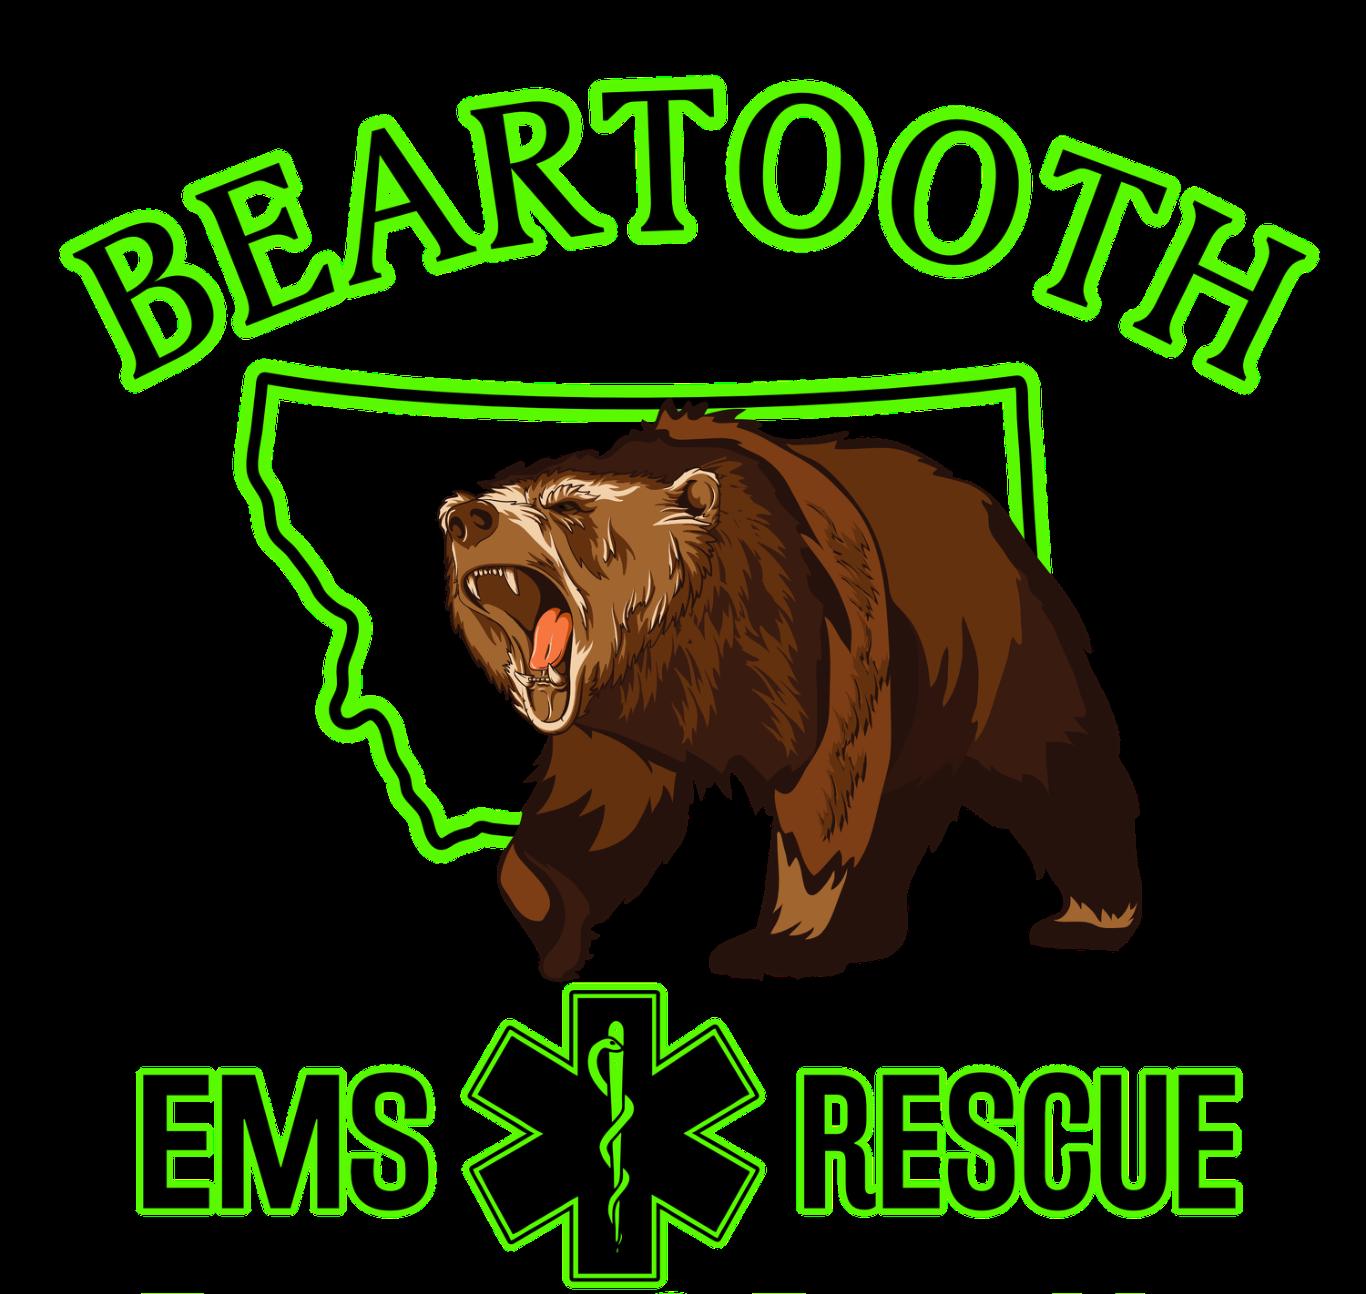 Beartooth EMT & Rescue Newsletter - Montanas Medical